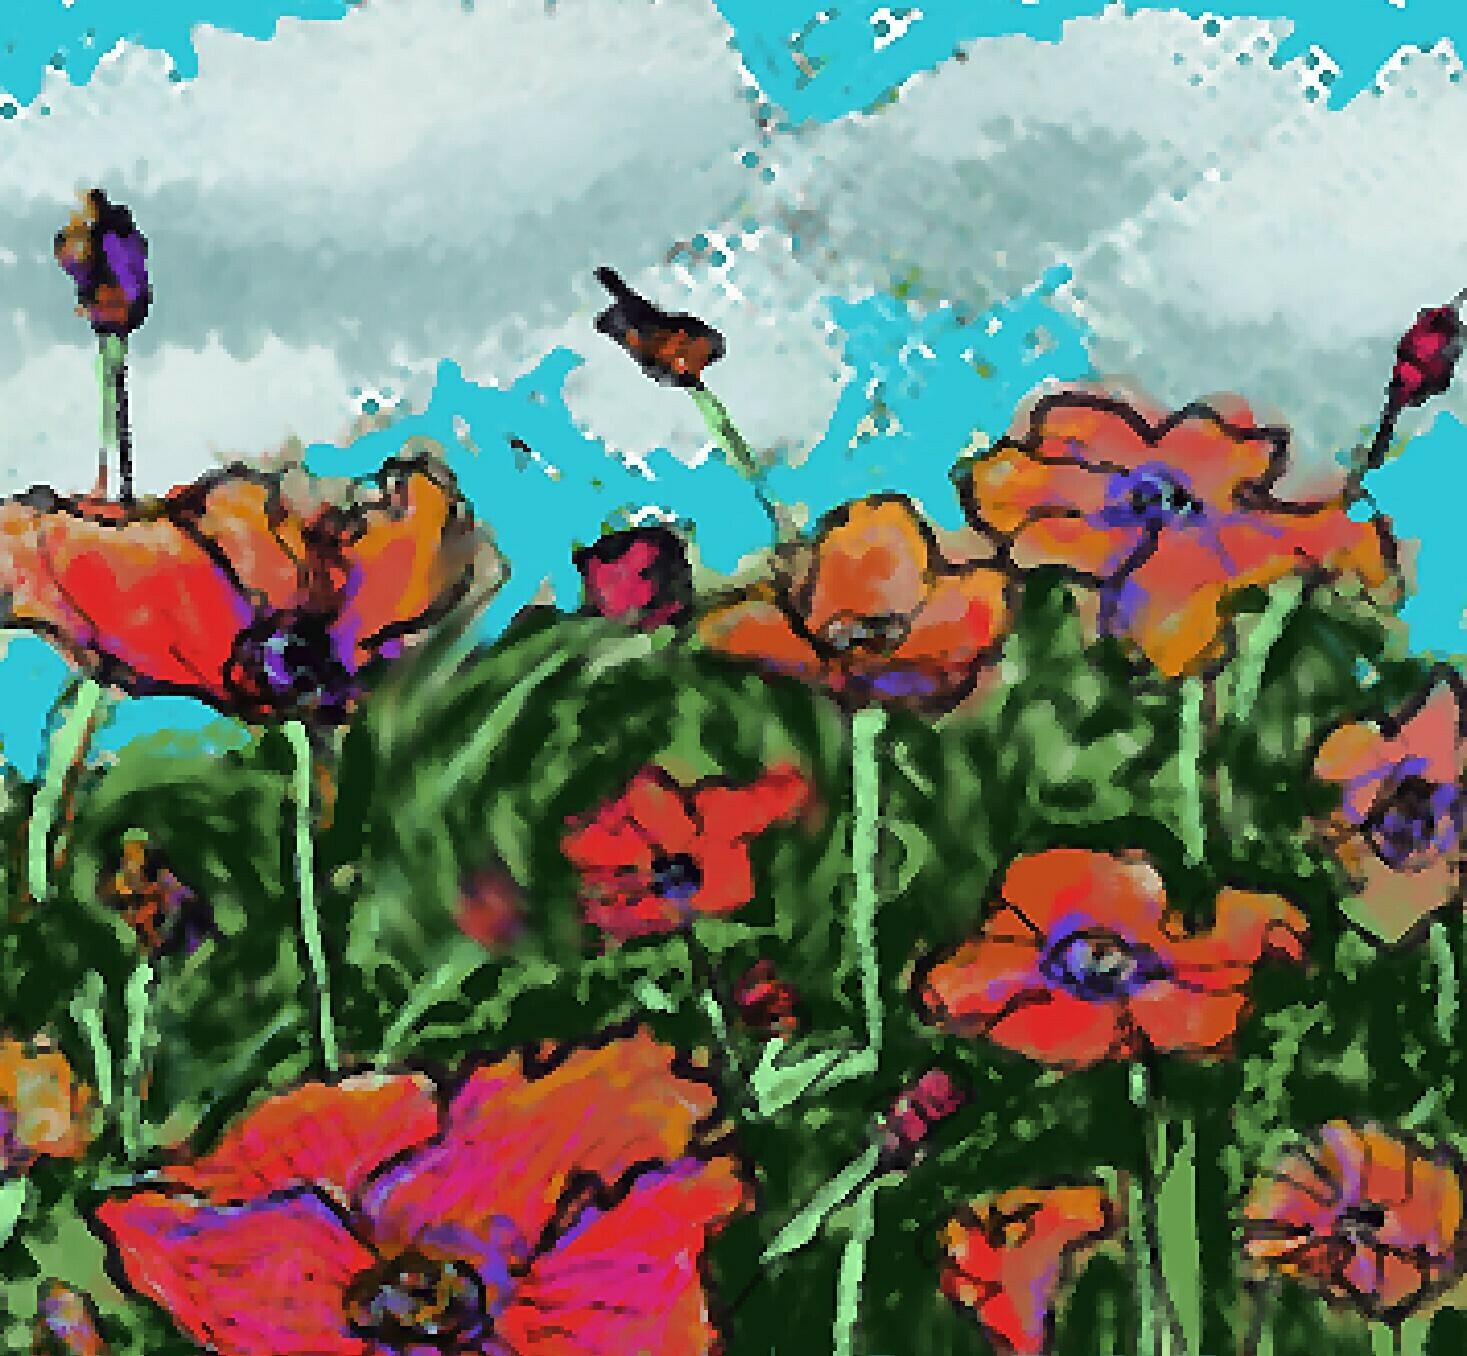 Poppies - Digital Art